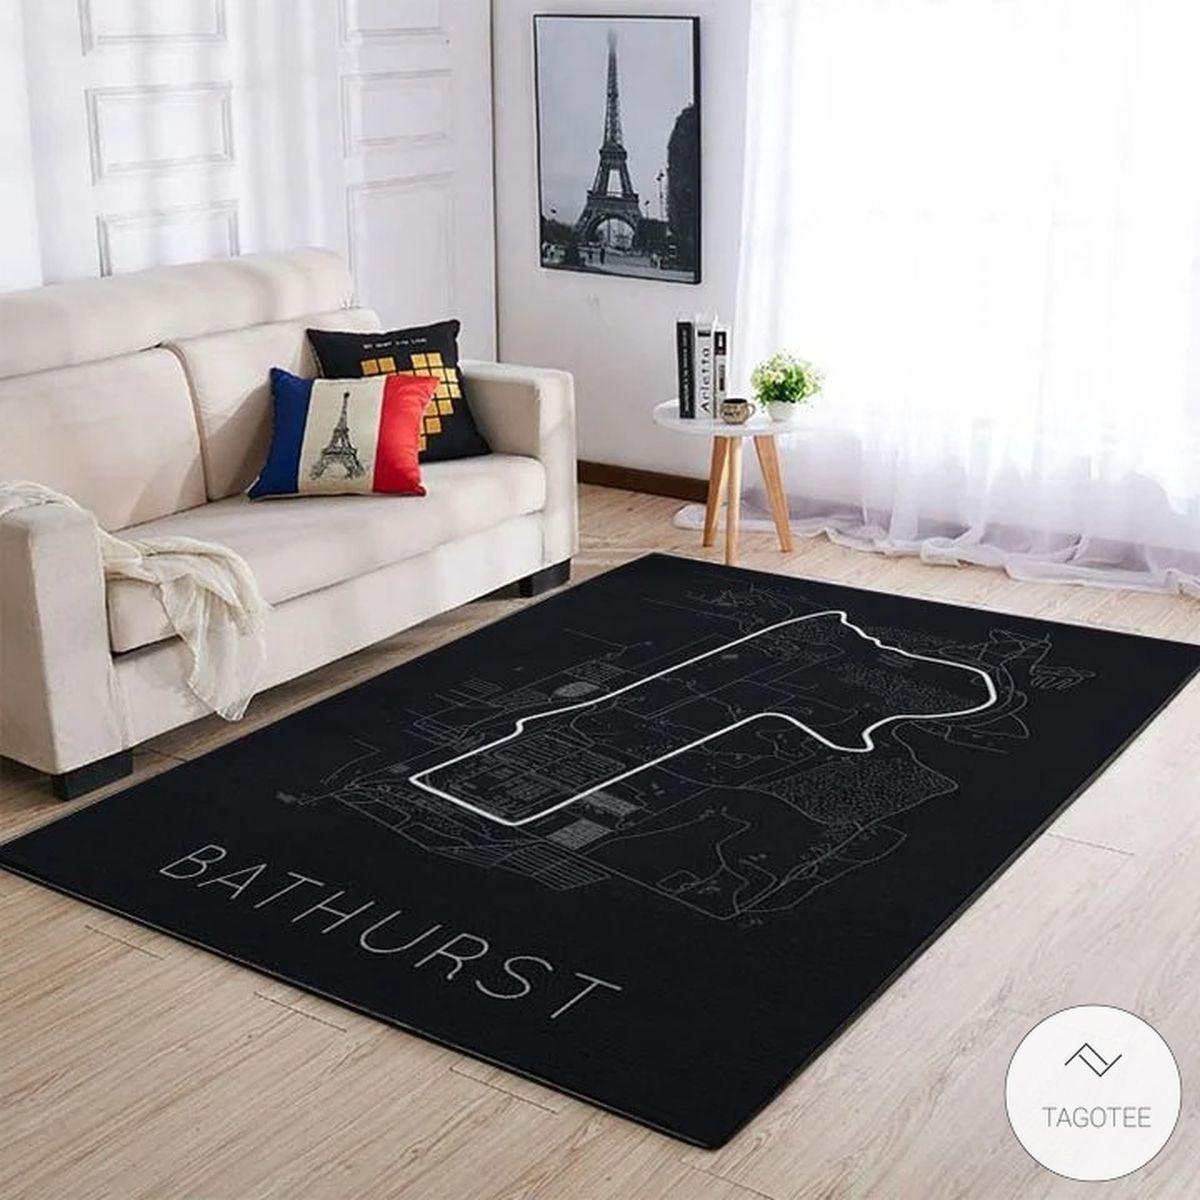 Bathurst F1 Circuit Map Rug